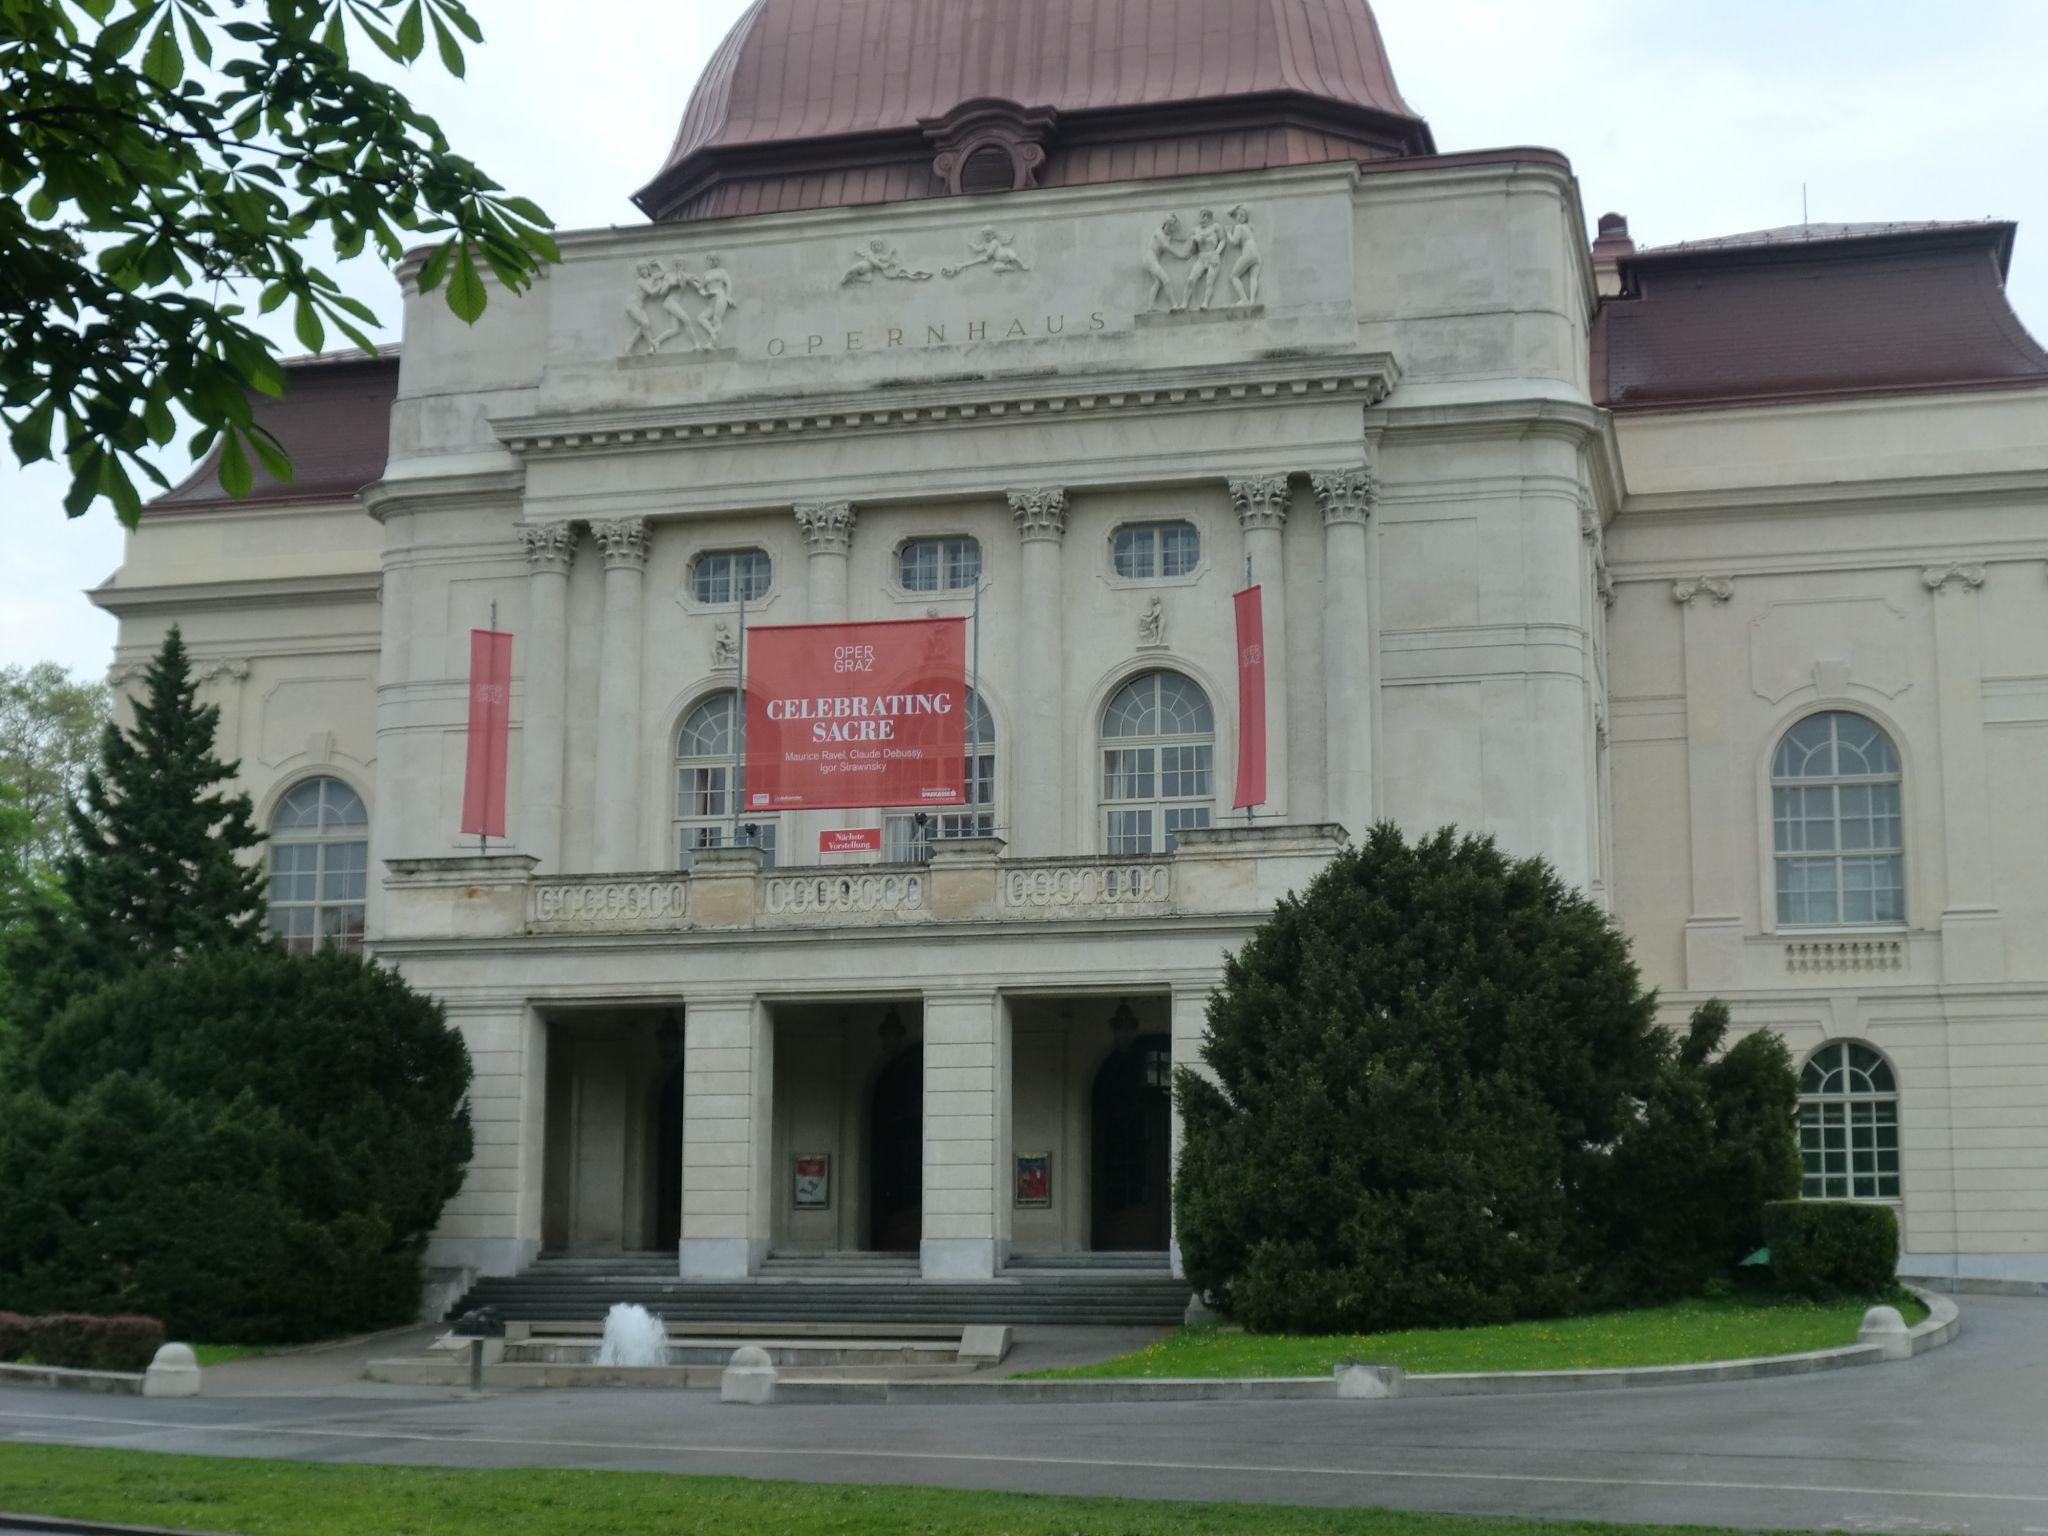 Graz opera 2 - Graz: tradition and modernity